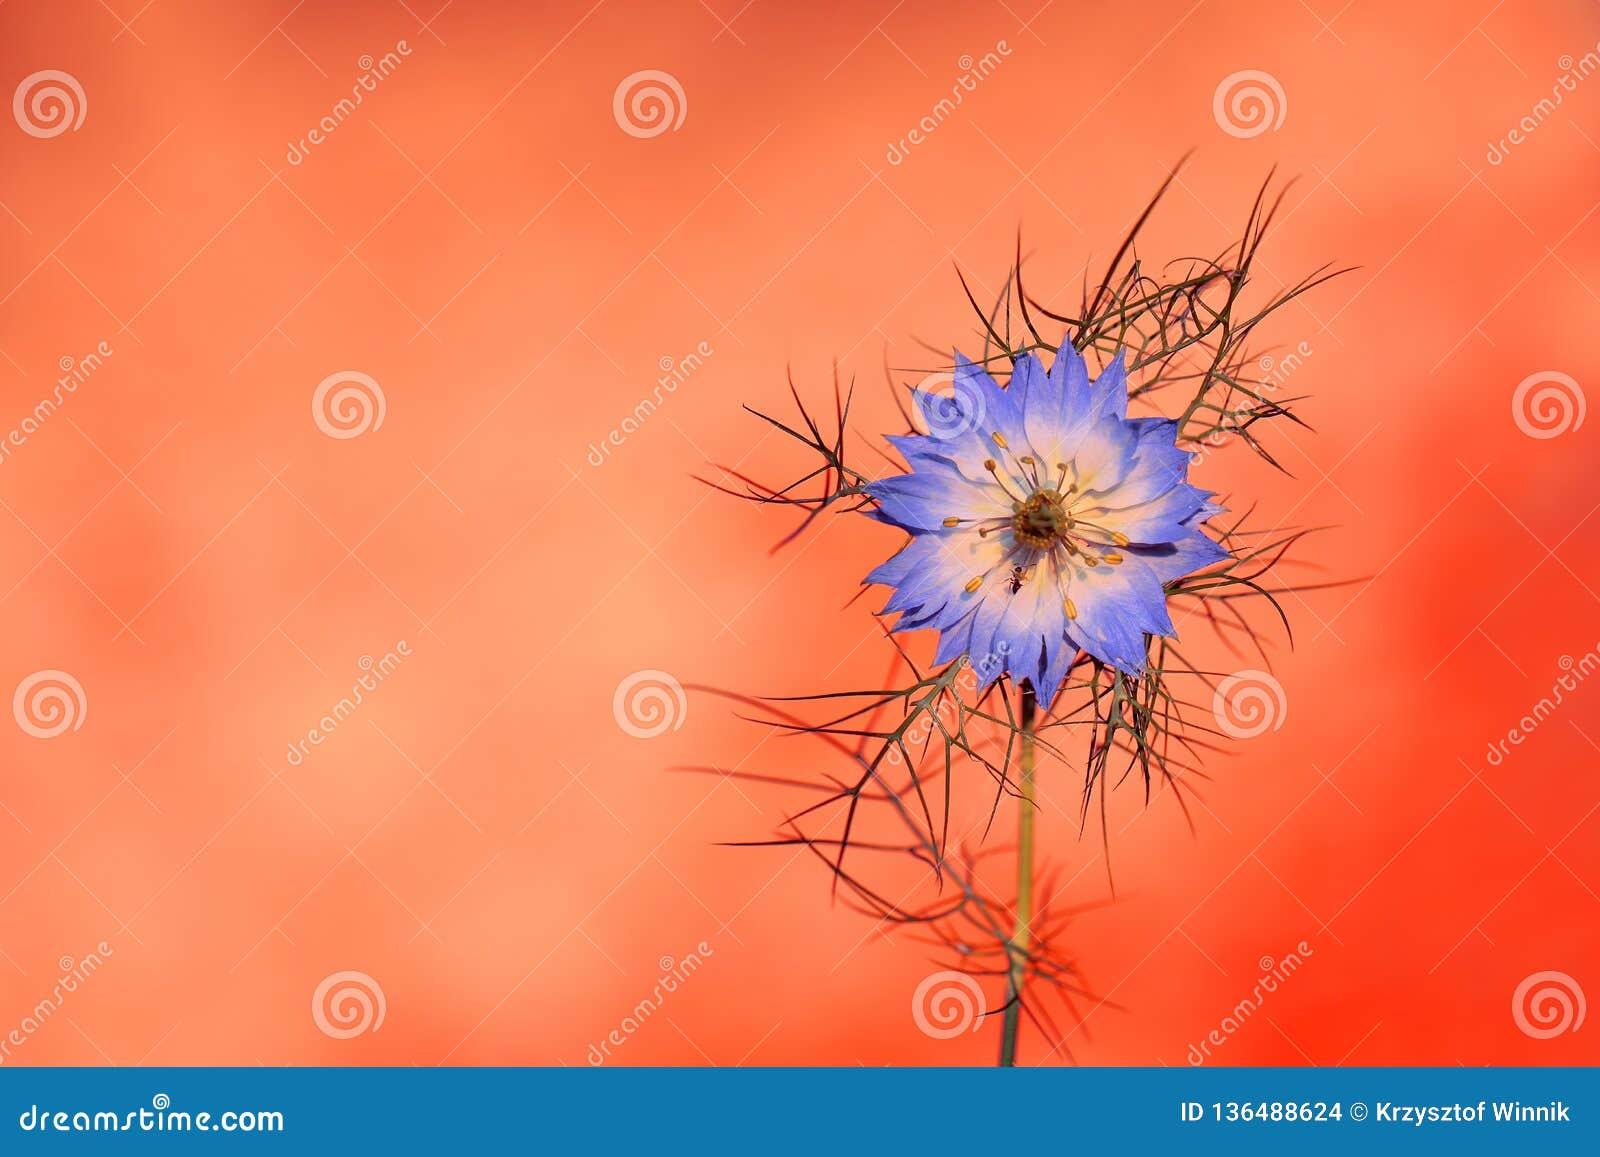 Nigella damascena is a rare flower grown in a home garden